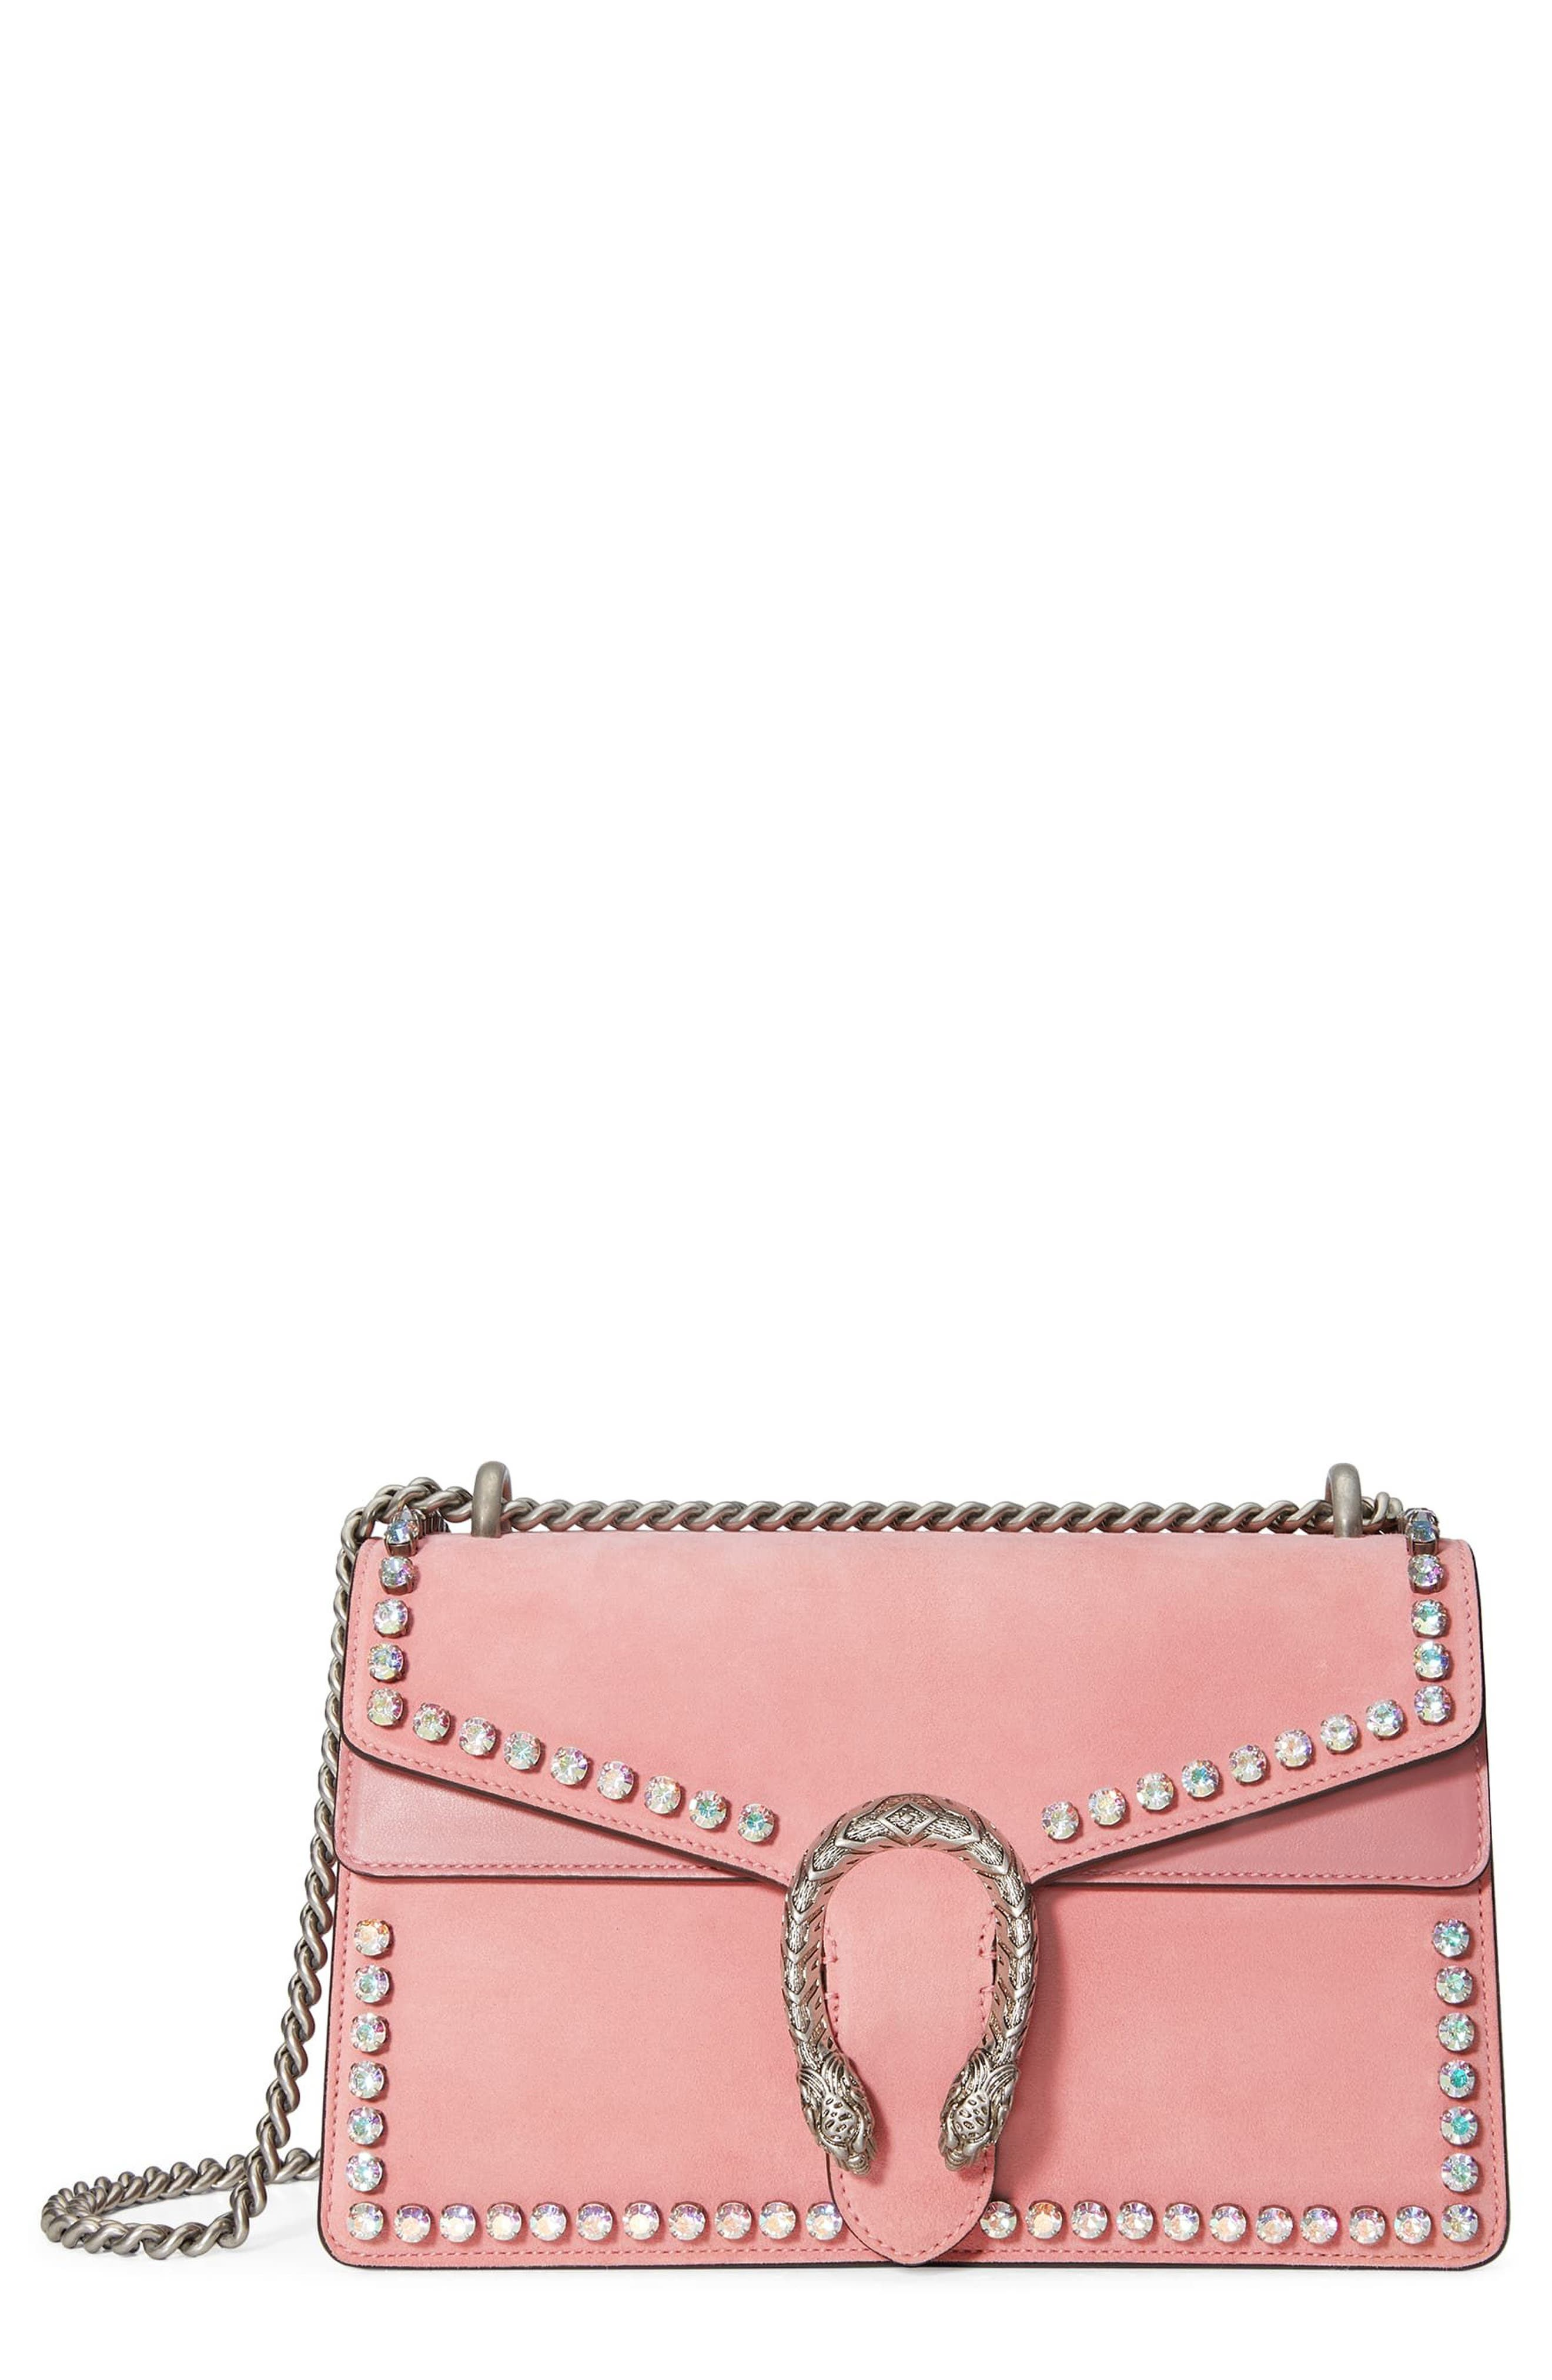 Small Dionysus Crystal Embellished Suede Shoulder Bag,                             Main thumbnail 1, color,                             650